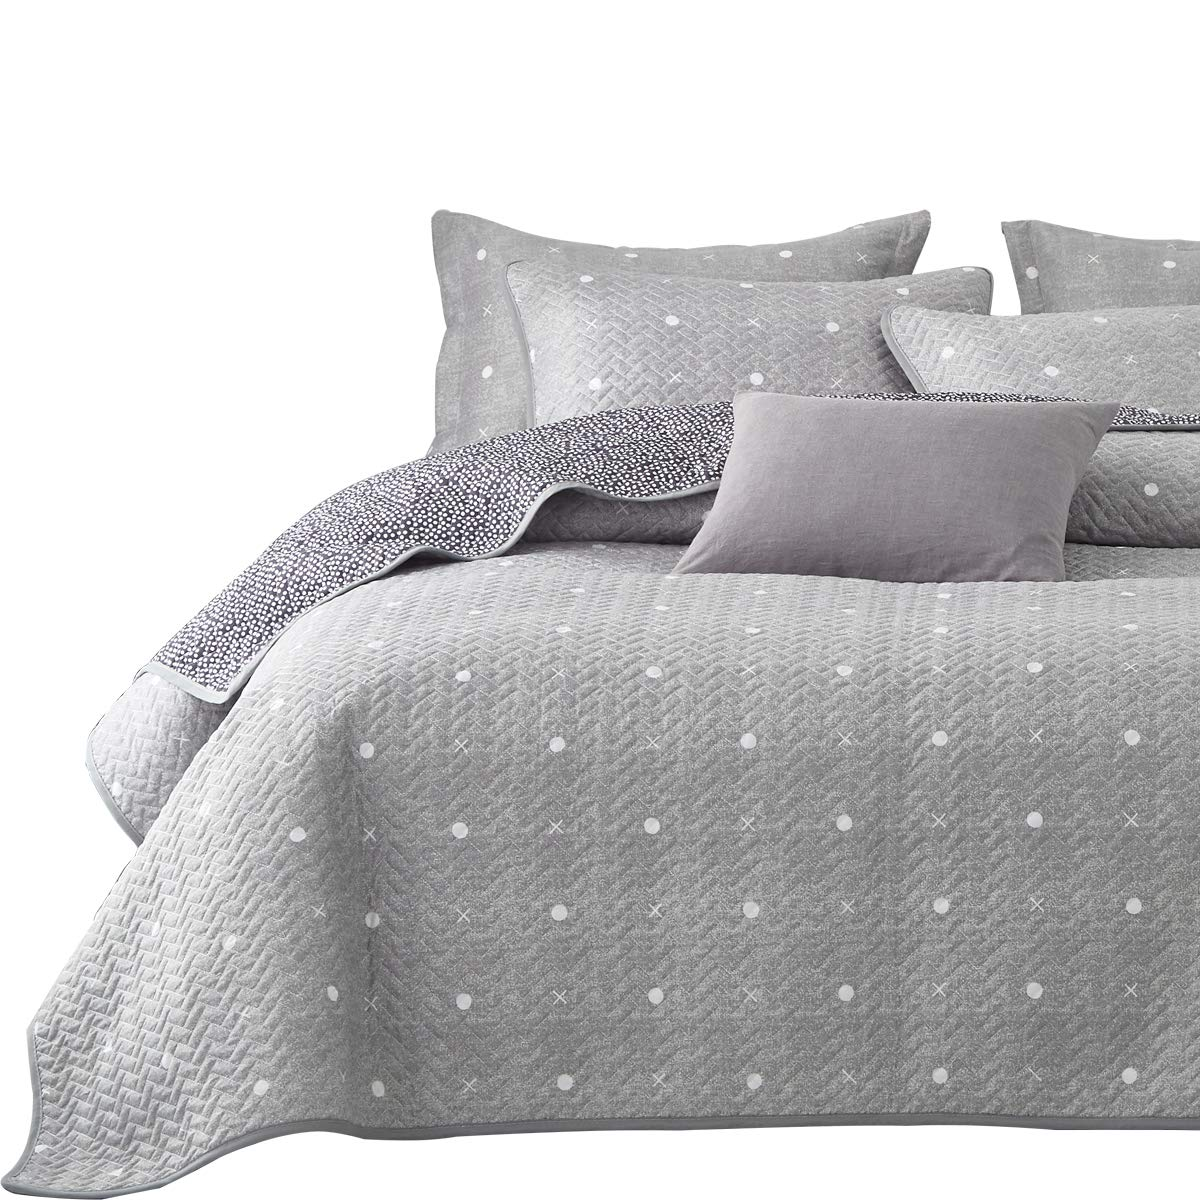 Uozzi Bedding 3 Piece Reversible Quilt Set Queen Size 92x90 Soft Microfiber Lightweight Coverlet Bedspread Summer Comforter Set Bed Cover Blanket for All Season Gray Dots & Cross (1 Quilt+ 2 Shams)